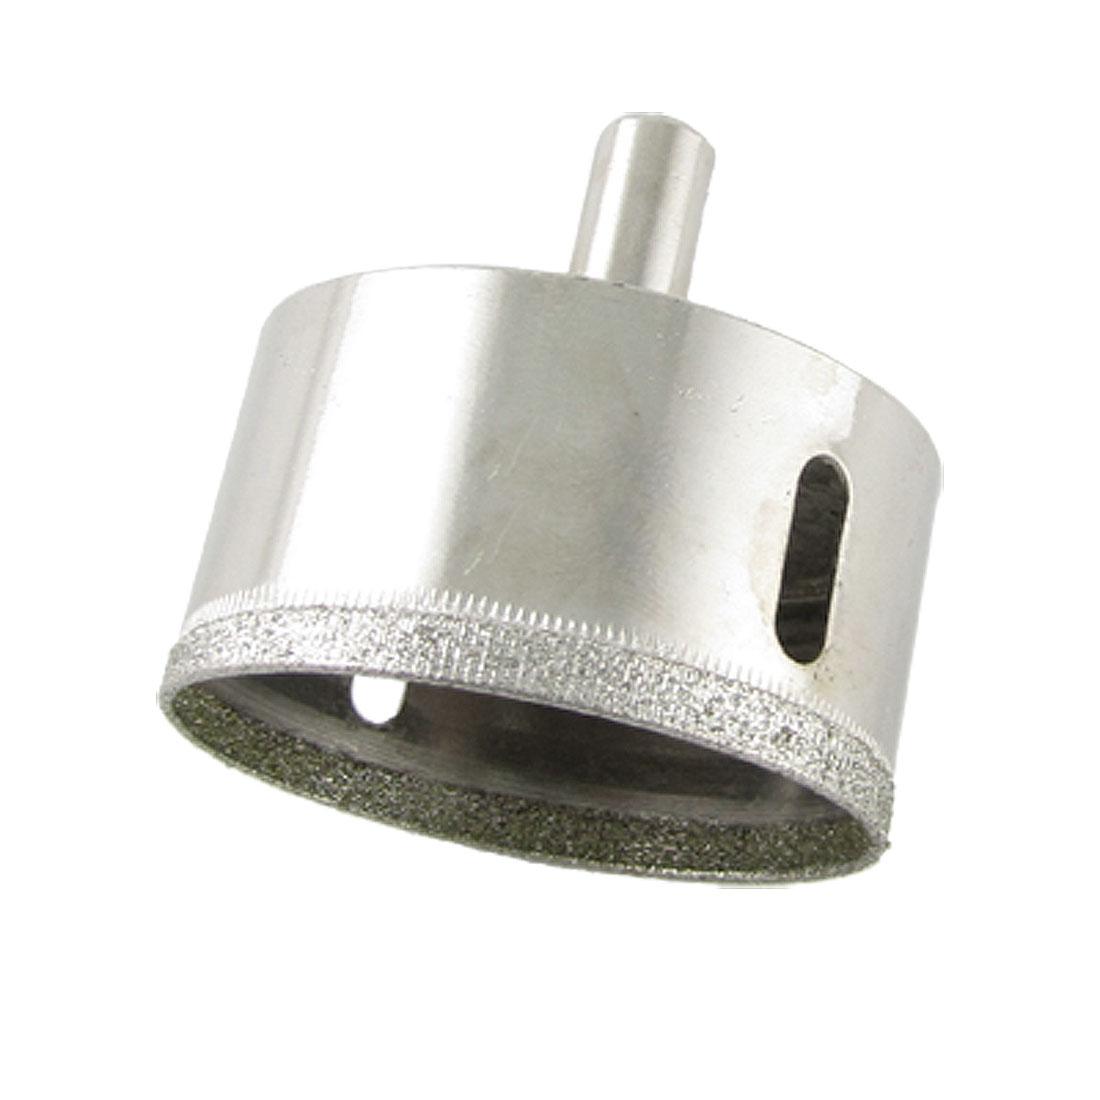 Silver Tone Straight Shank Diamond Tipped 55mm Dia. Glasses Hole Saw